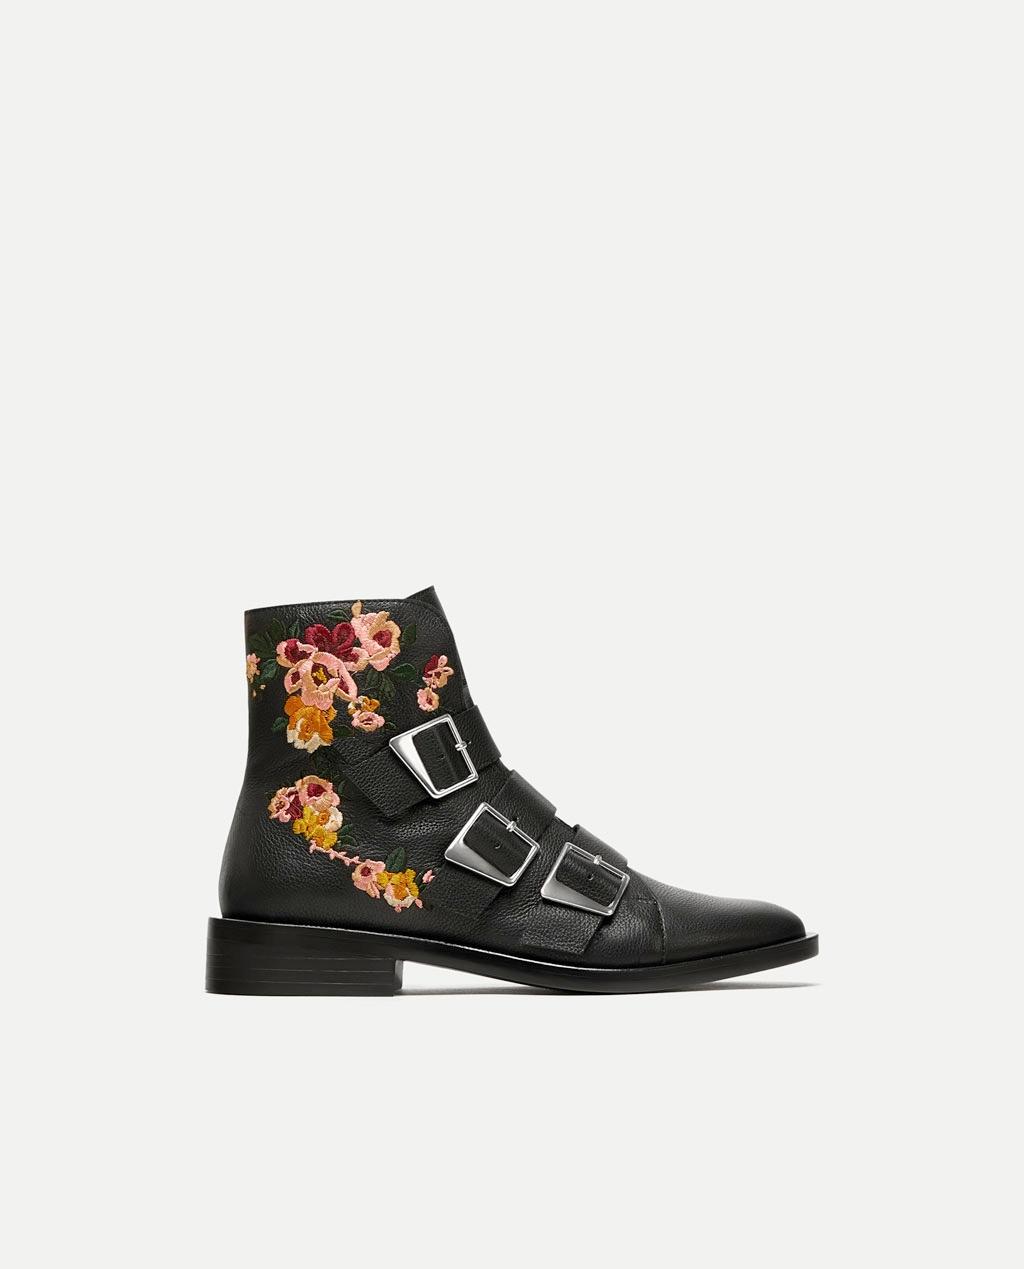 Boots, £69.99, Zara